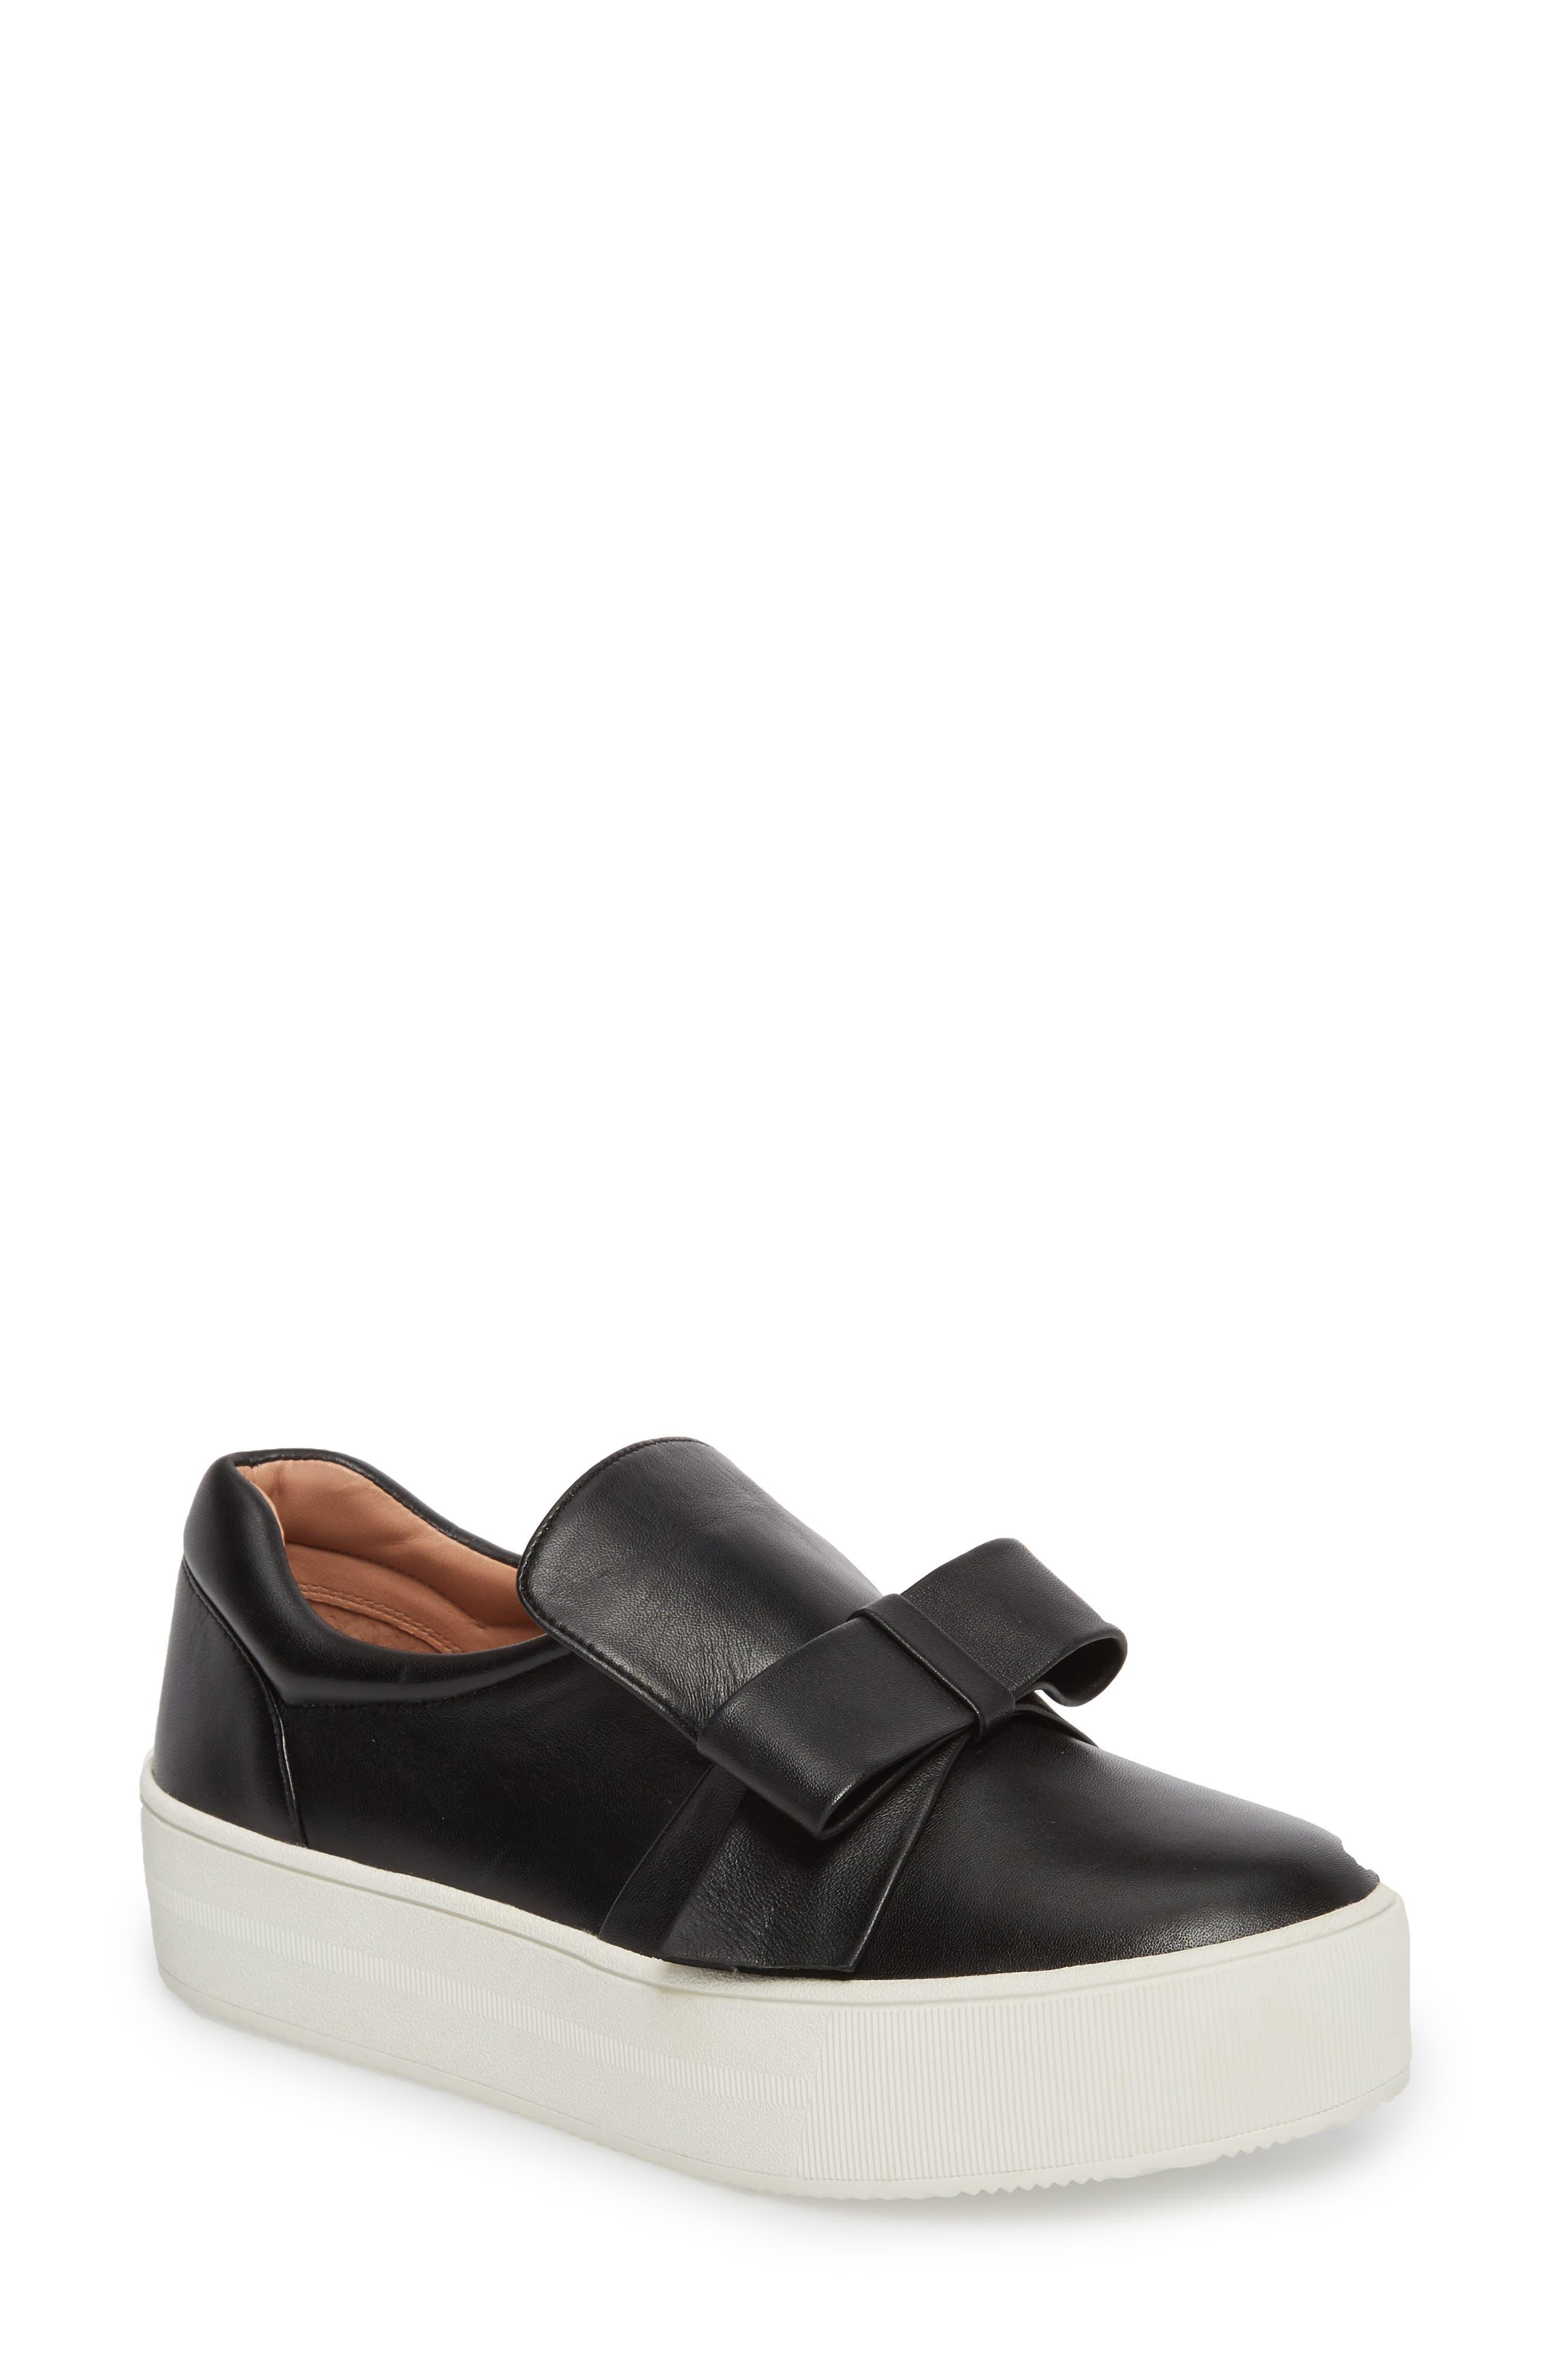 Vania Bow Platform Sneaker,                             Main thumbnail 1, color,                             001